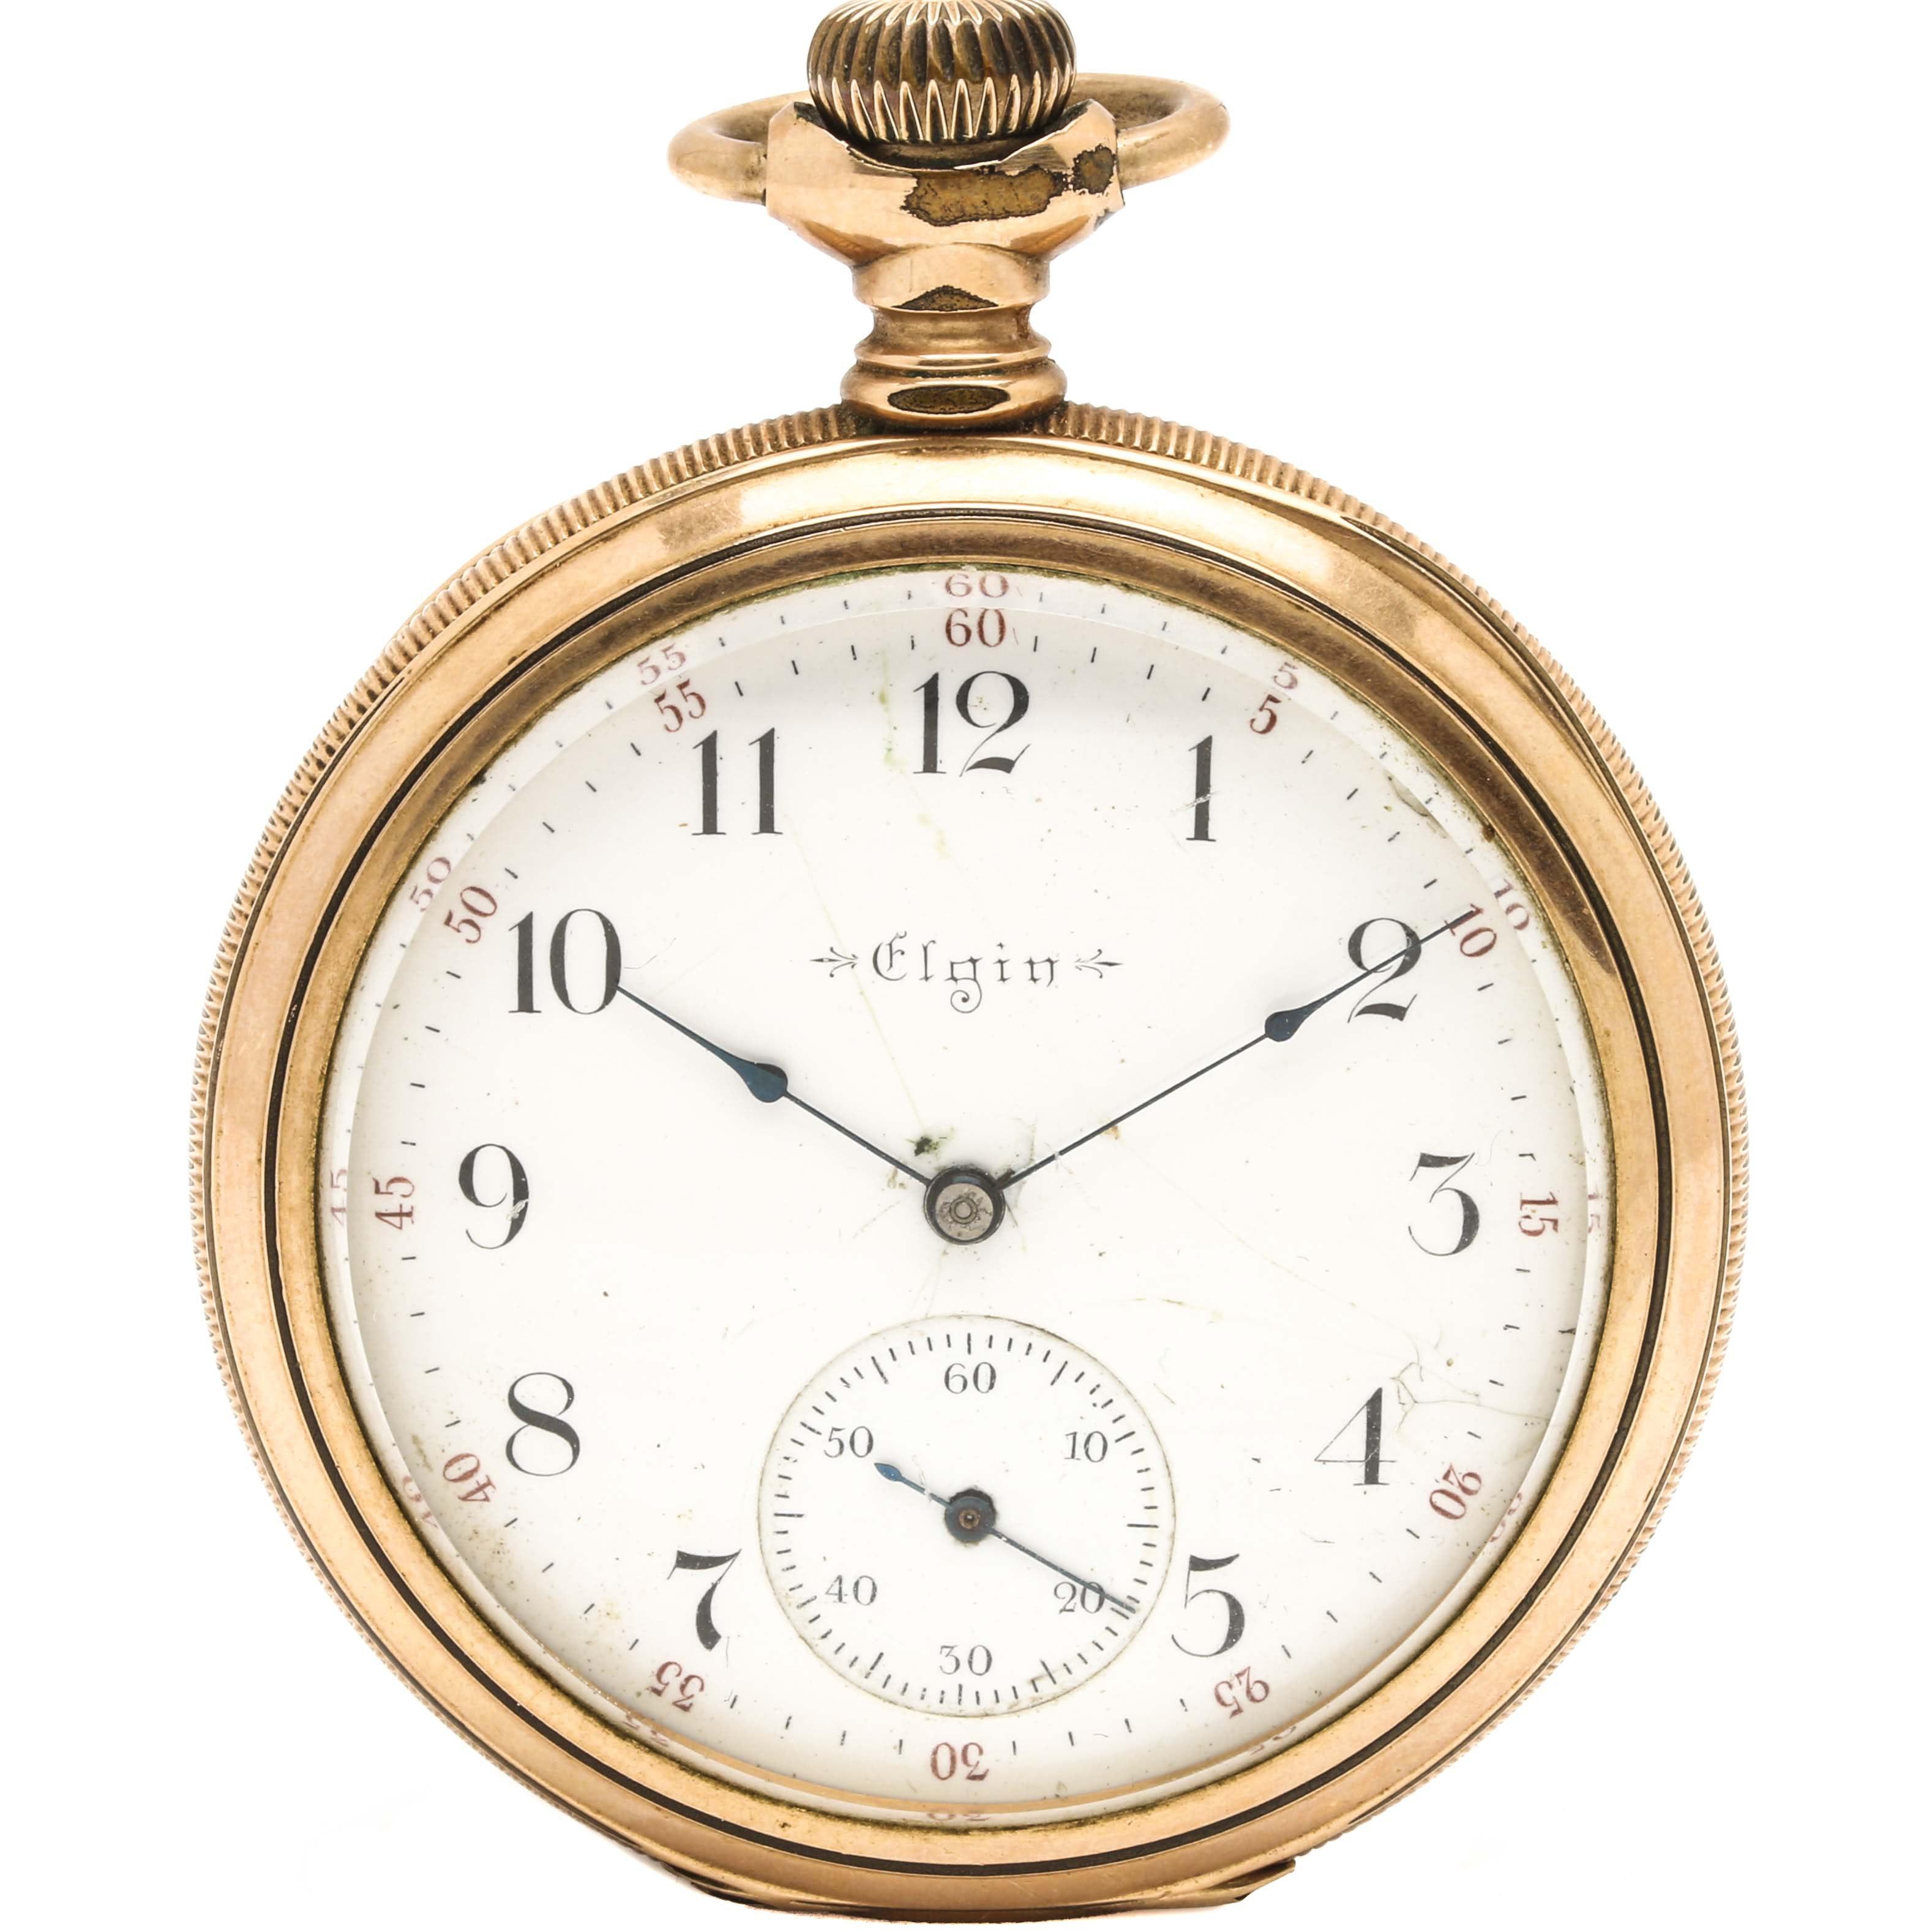 Antique Elgin Open Face Pocket Watch